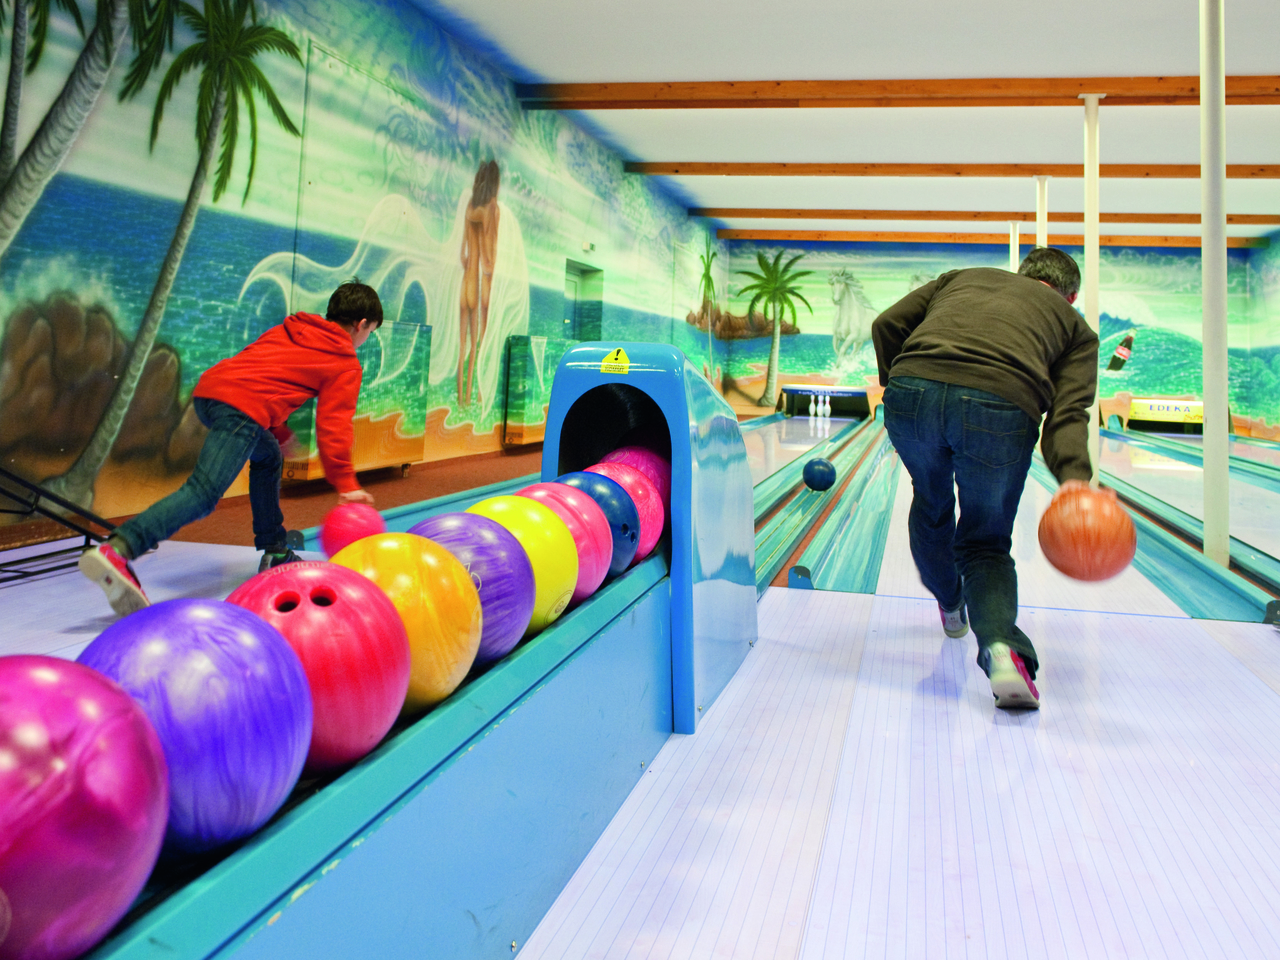 Landal Salztal Paradies in Bad Sachsa - Bowlingbahn